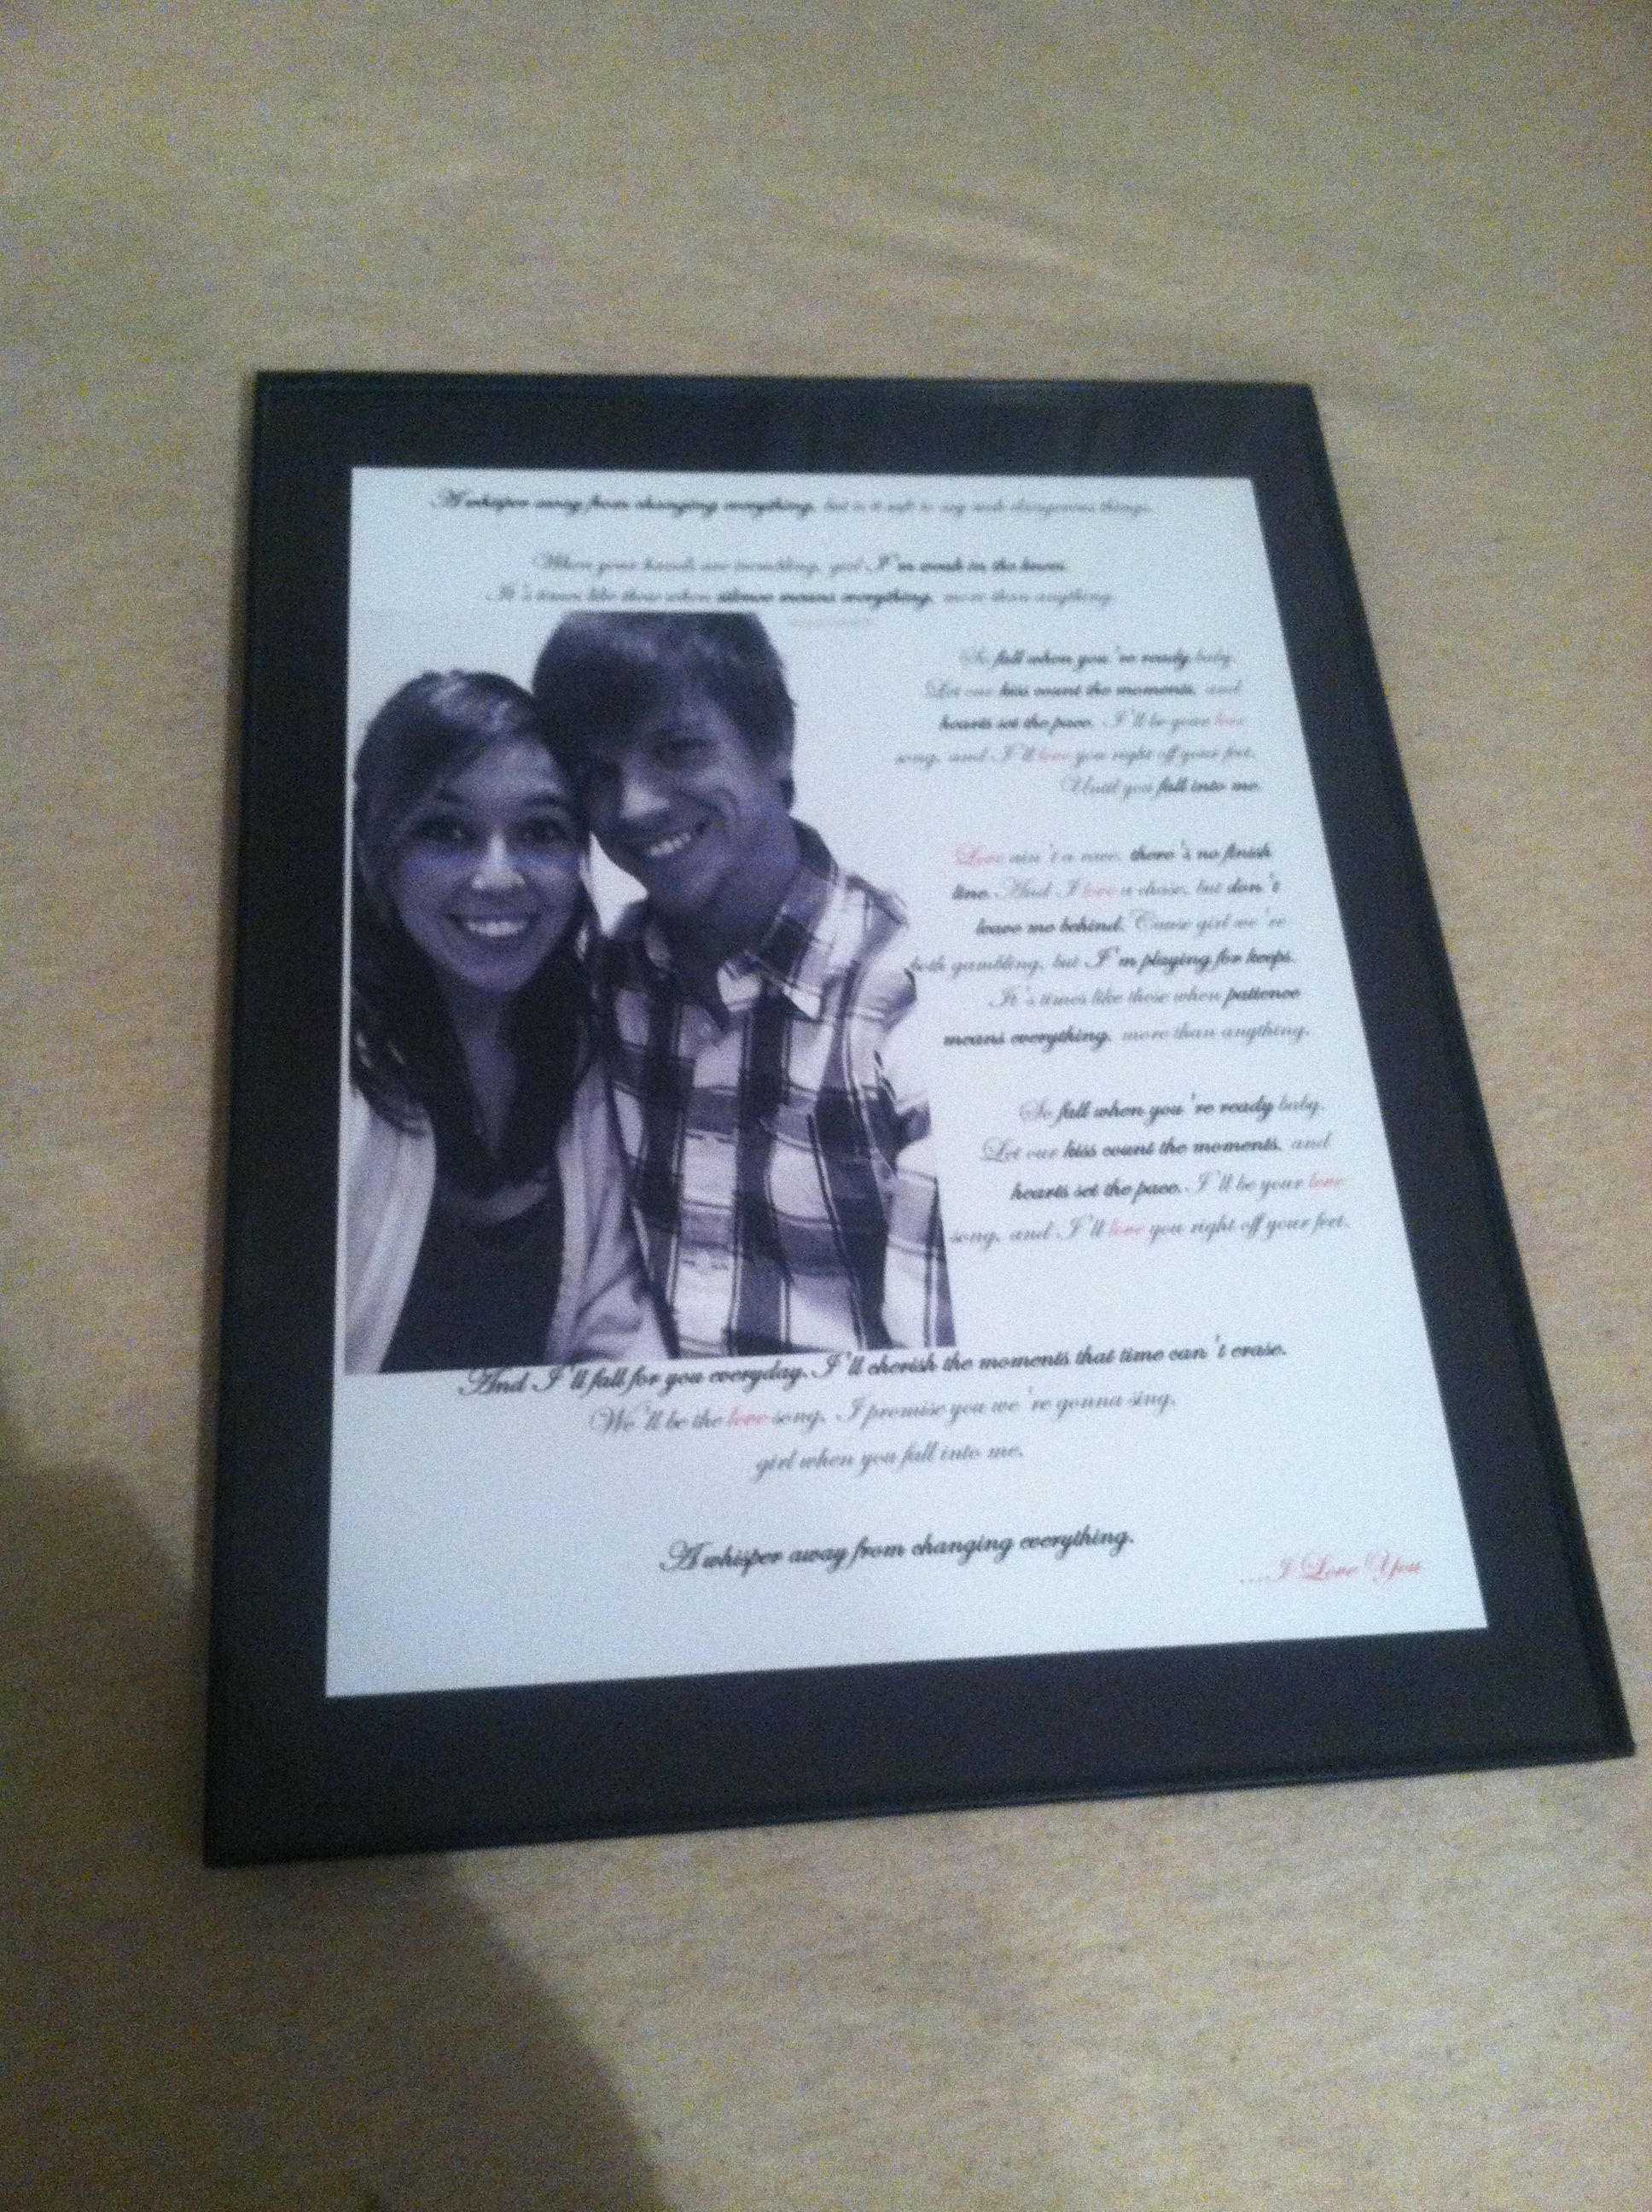 Picture with song lyrics diy boyfriend gift gifts pinterest diy boyfriend gift solutioingenieria Image collections